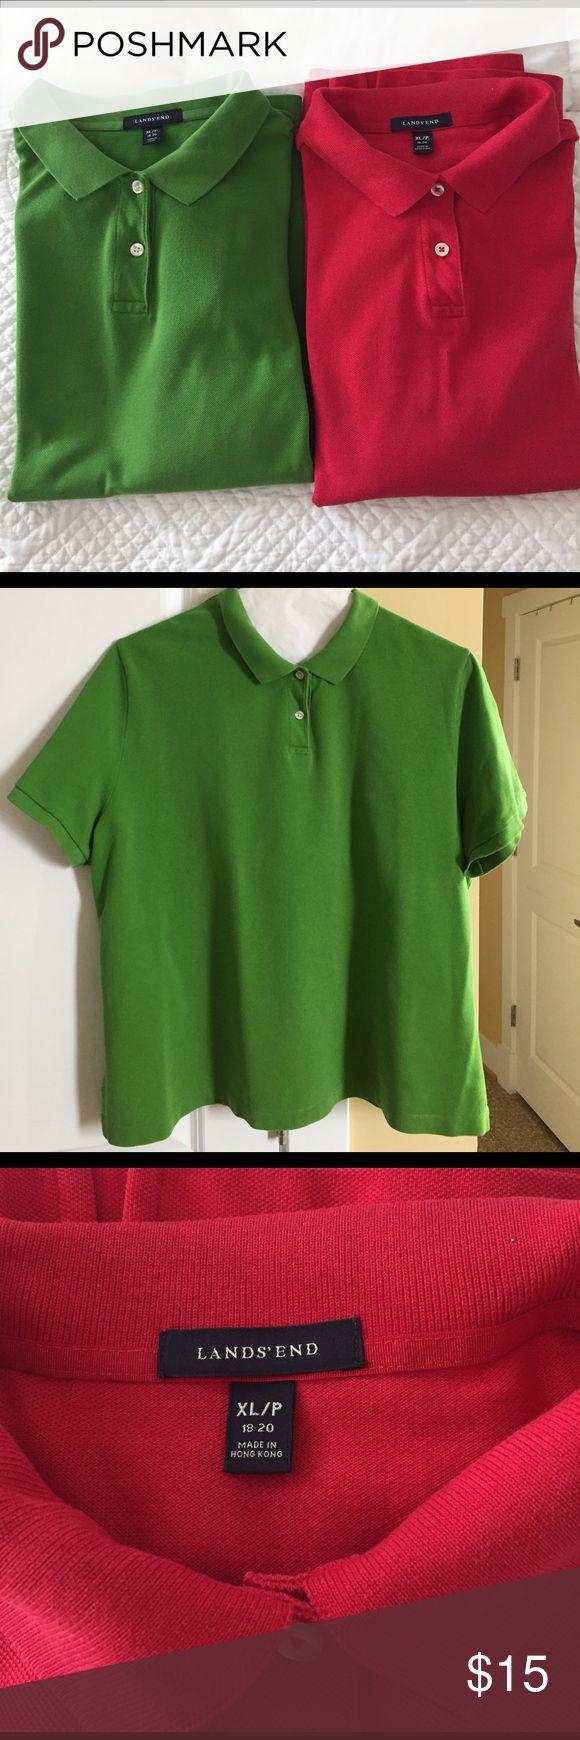 Lands End pique cotton polo shirts TWO! EUC polo shirts from Lands End Lands' End Tops